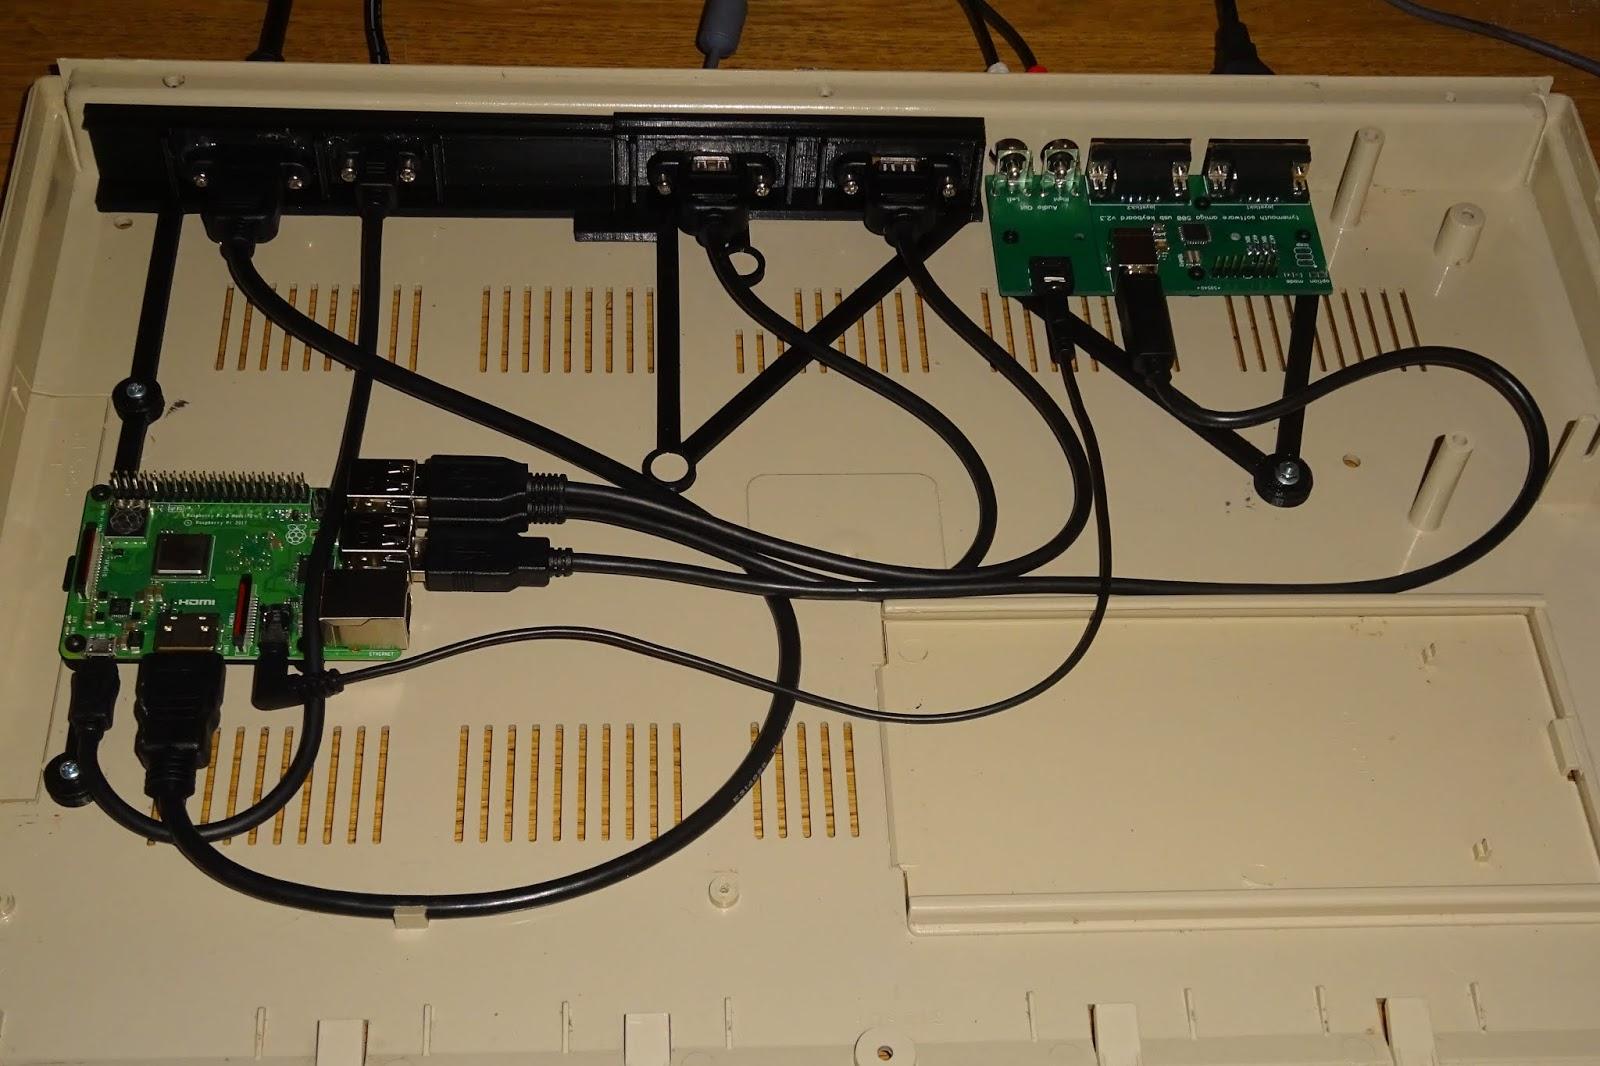 Tynemouth Software: Amiga 500 USB keyboard with Raspberry Pi 3